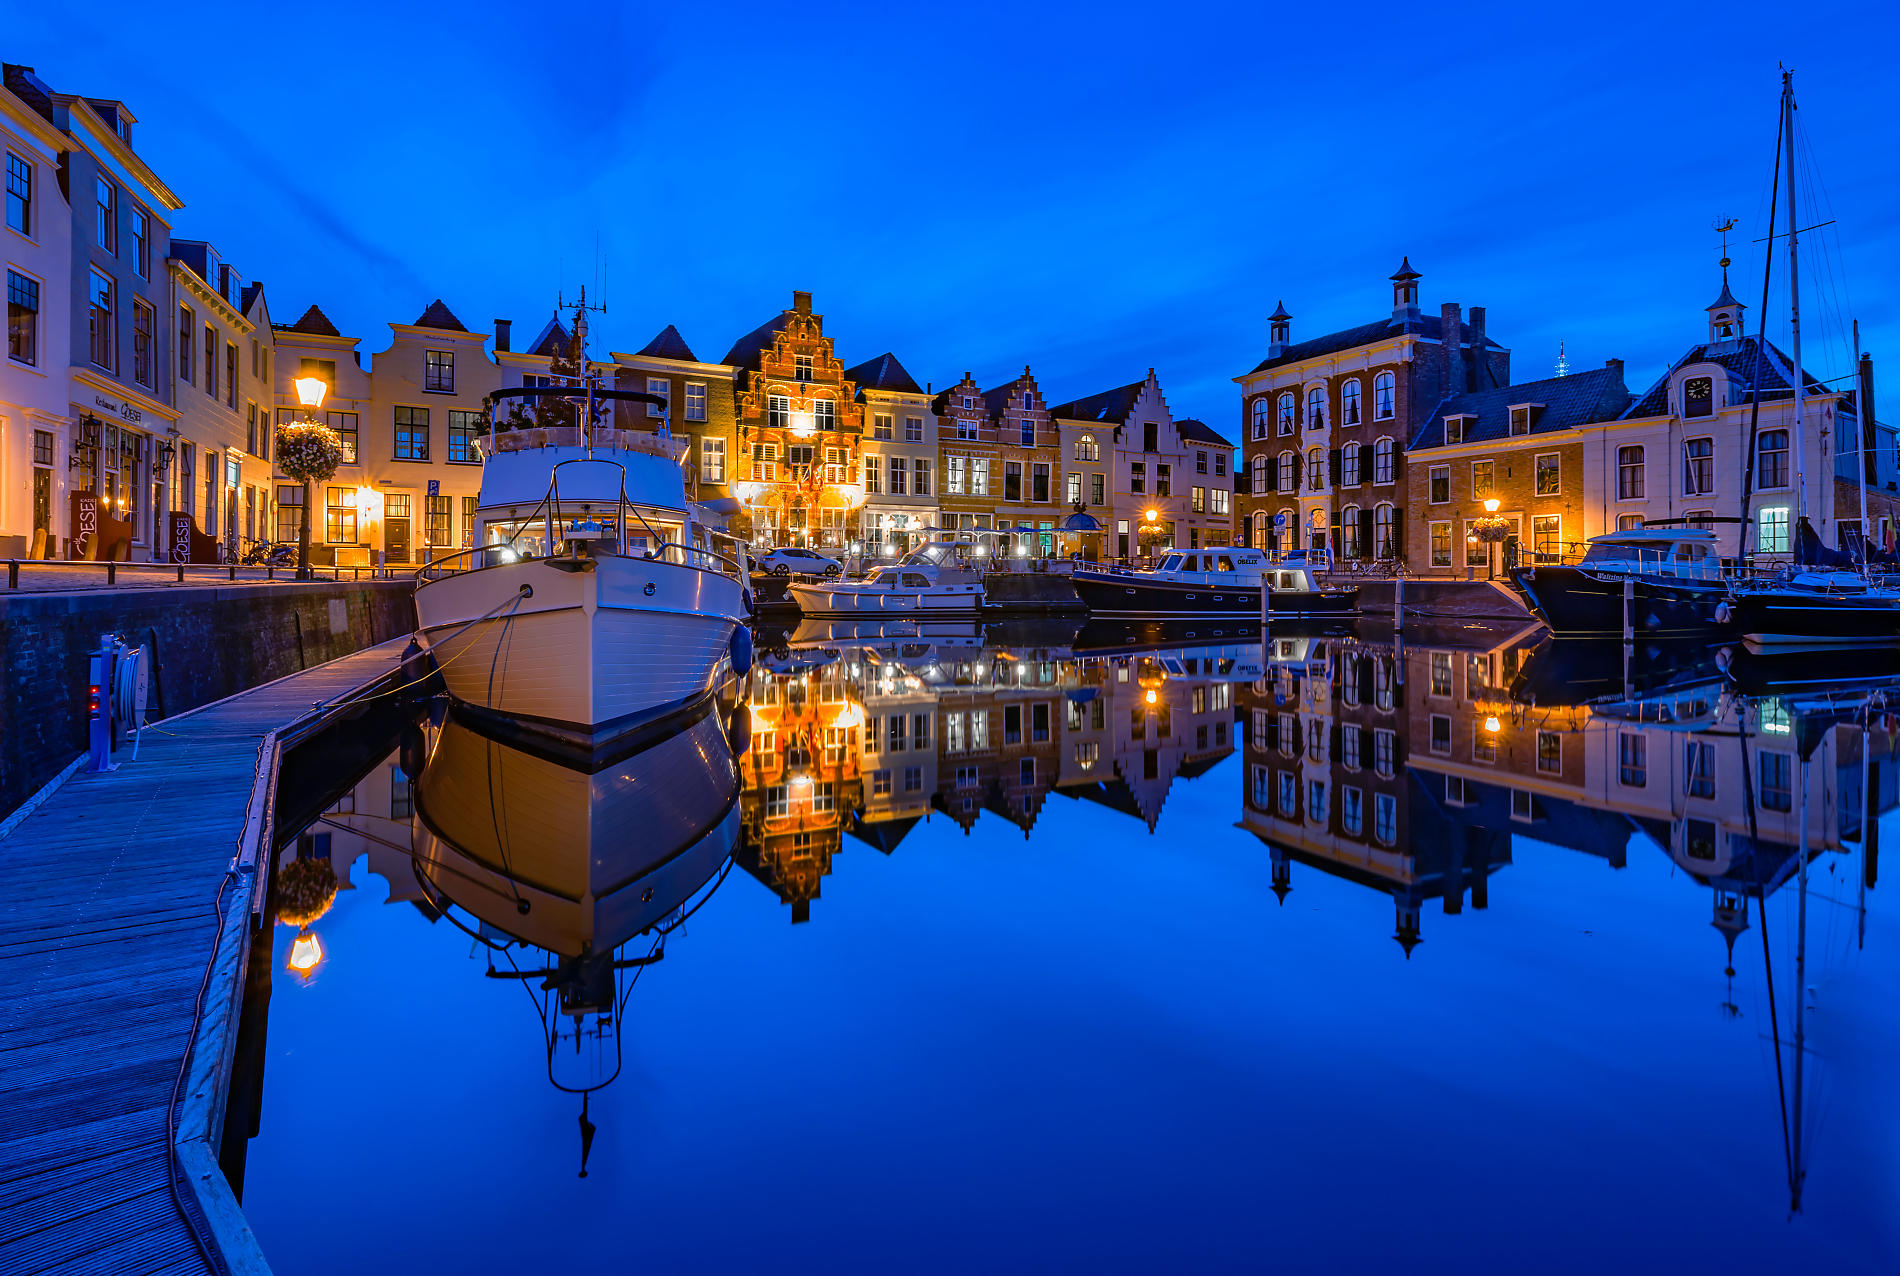 Stadshaven, Goes, Netherlands